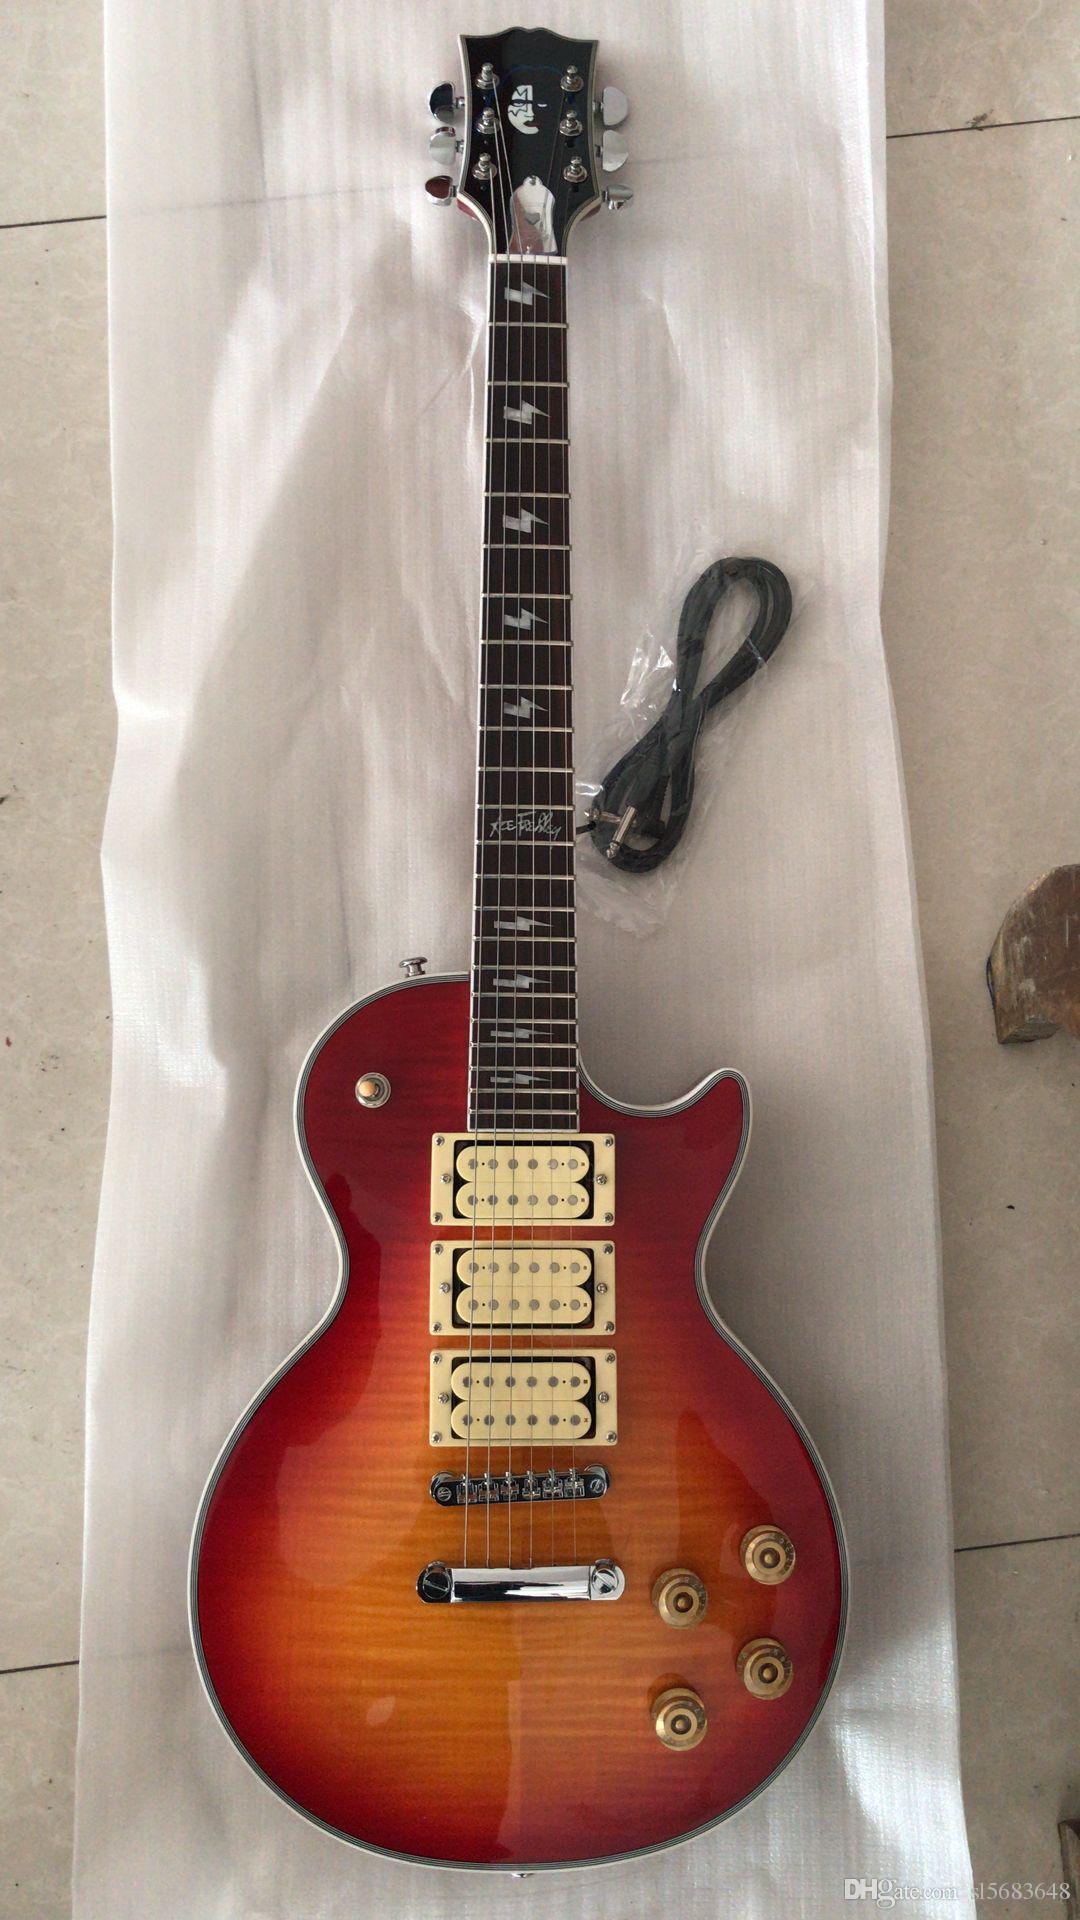 Kostenloser Versand! Großhandel kundenspezifische Qualität 6 String E-Gitarre in Sunburst 0,3 Pickups Hardware-Gitarre Chrom, 180315